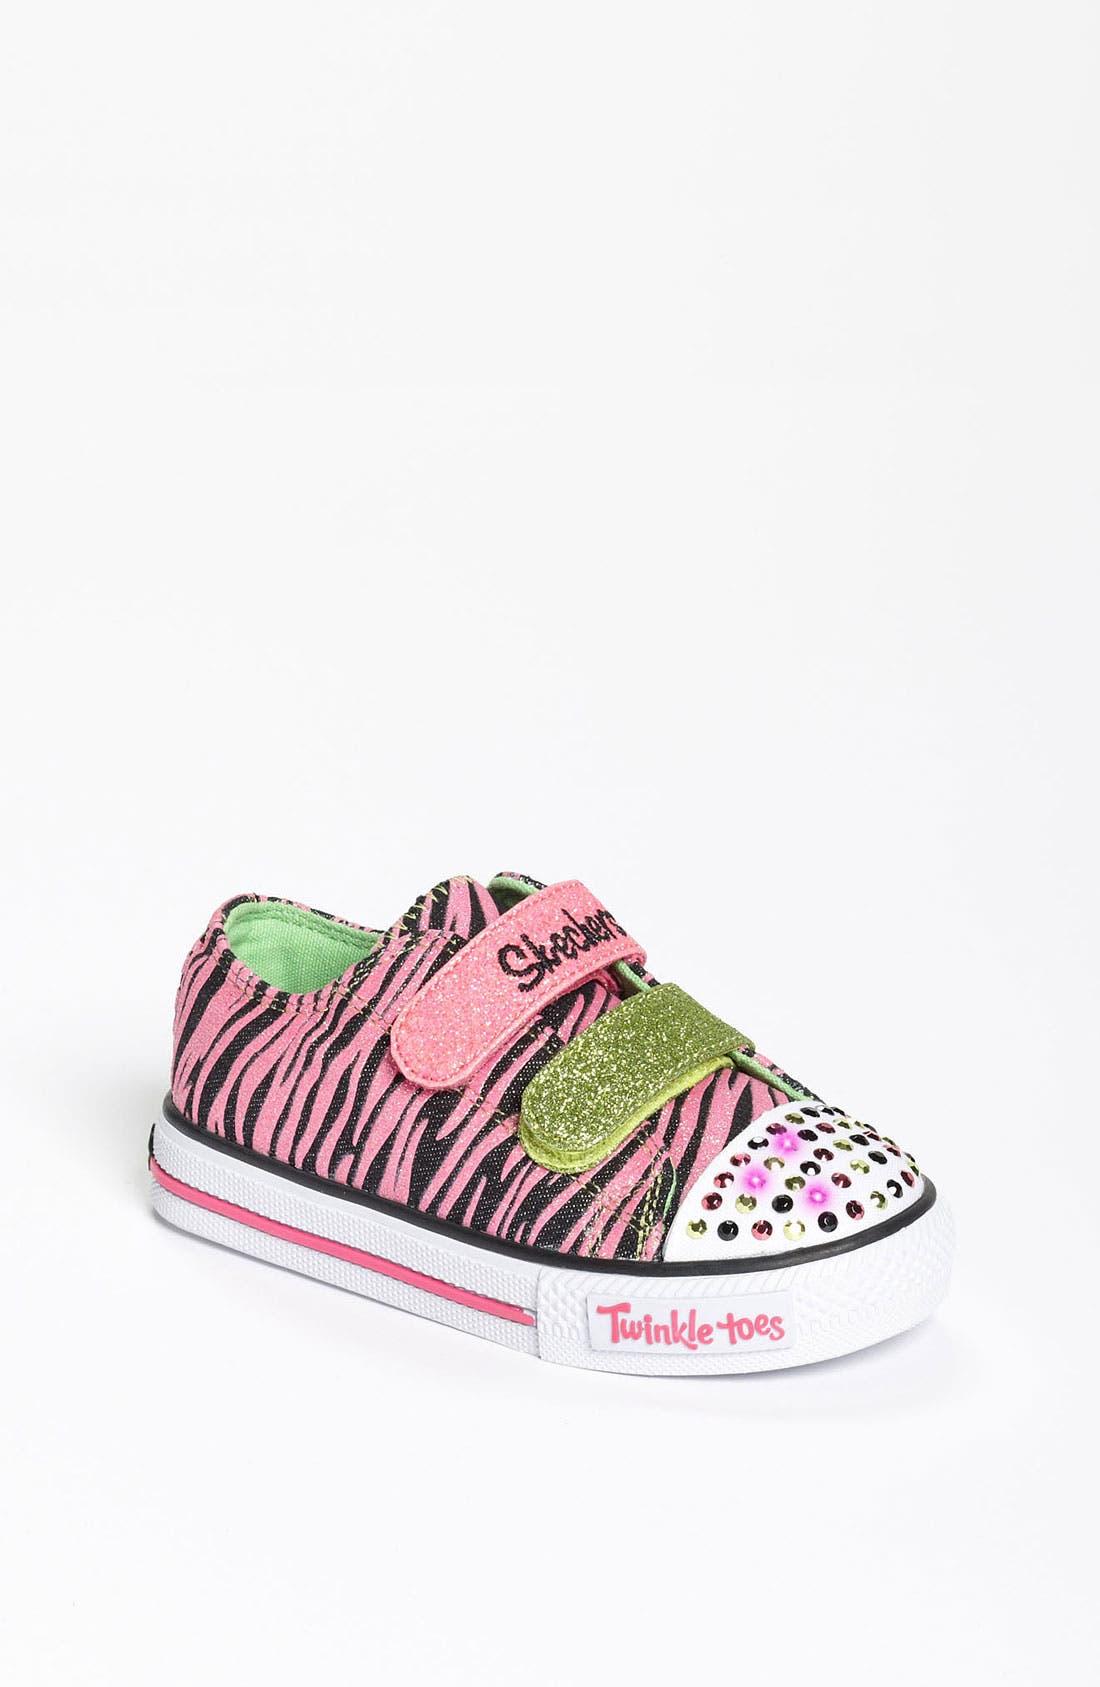 Main Image - SKECHERS 'Twinkle Toes' Light-Up Sneaker (Walker & Toddler)(Nordstrom Exclusive)